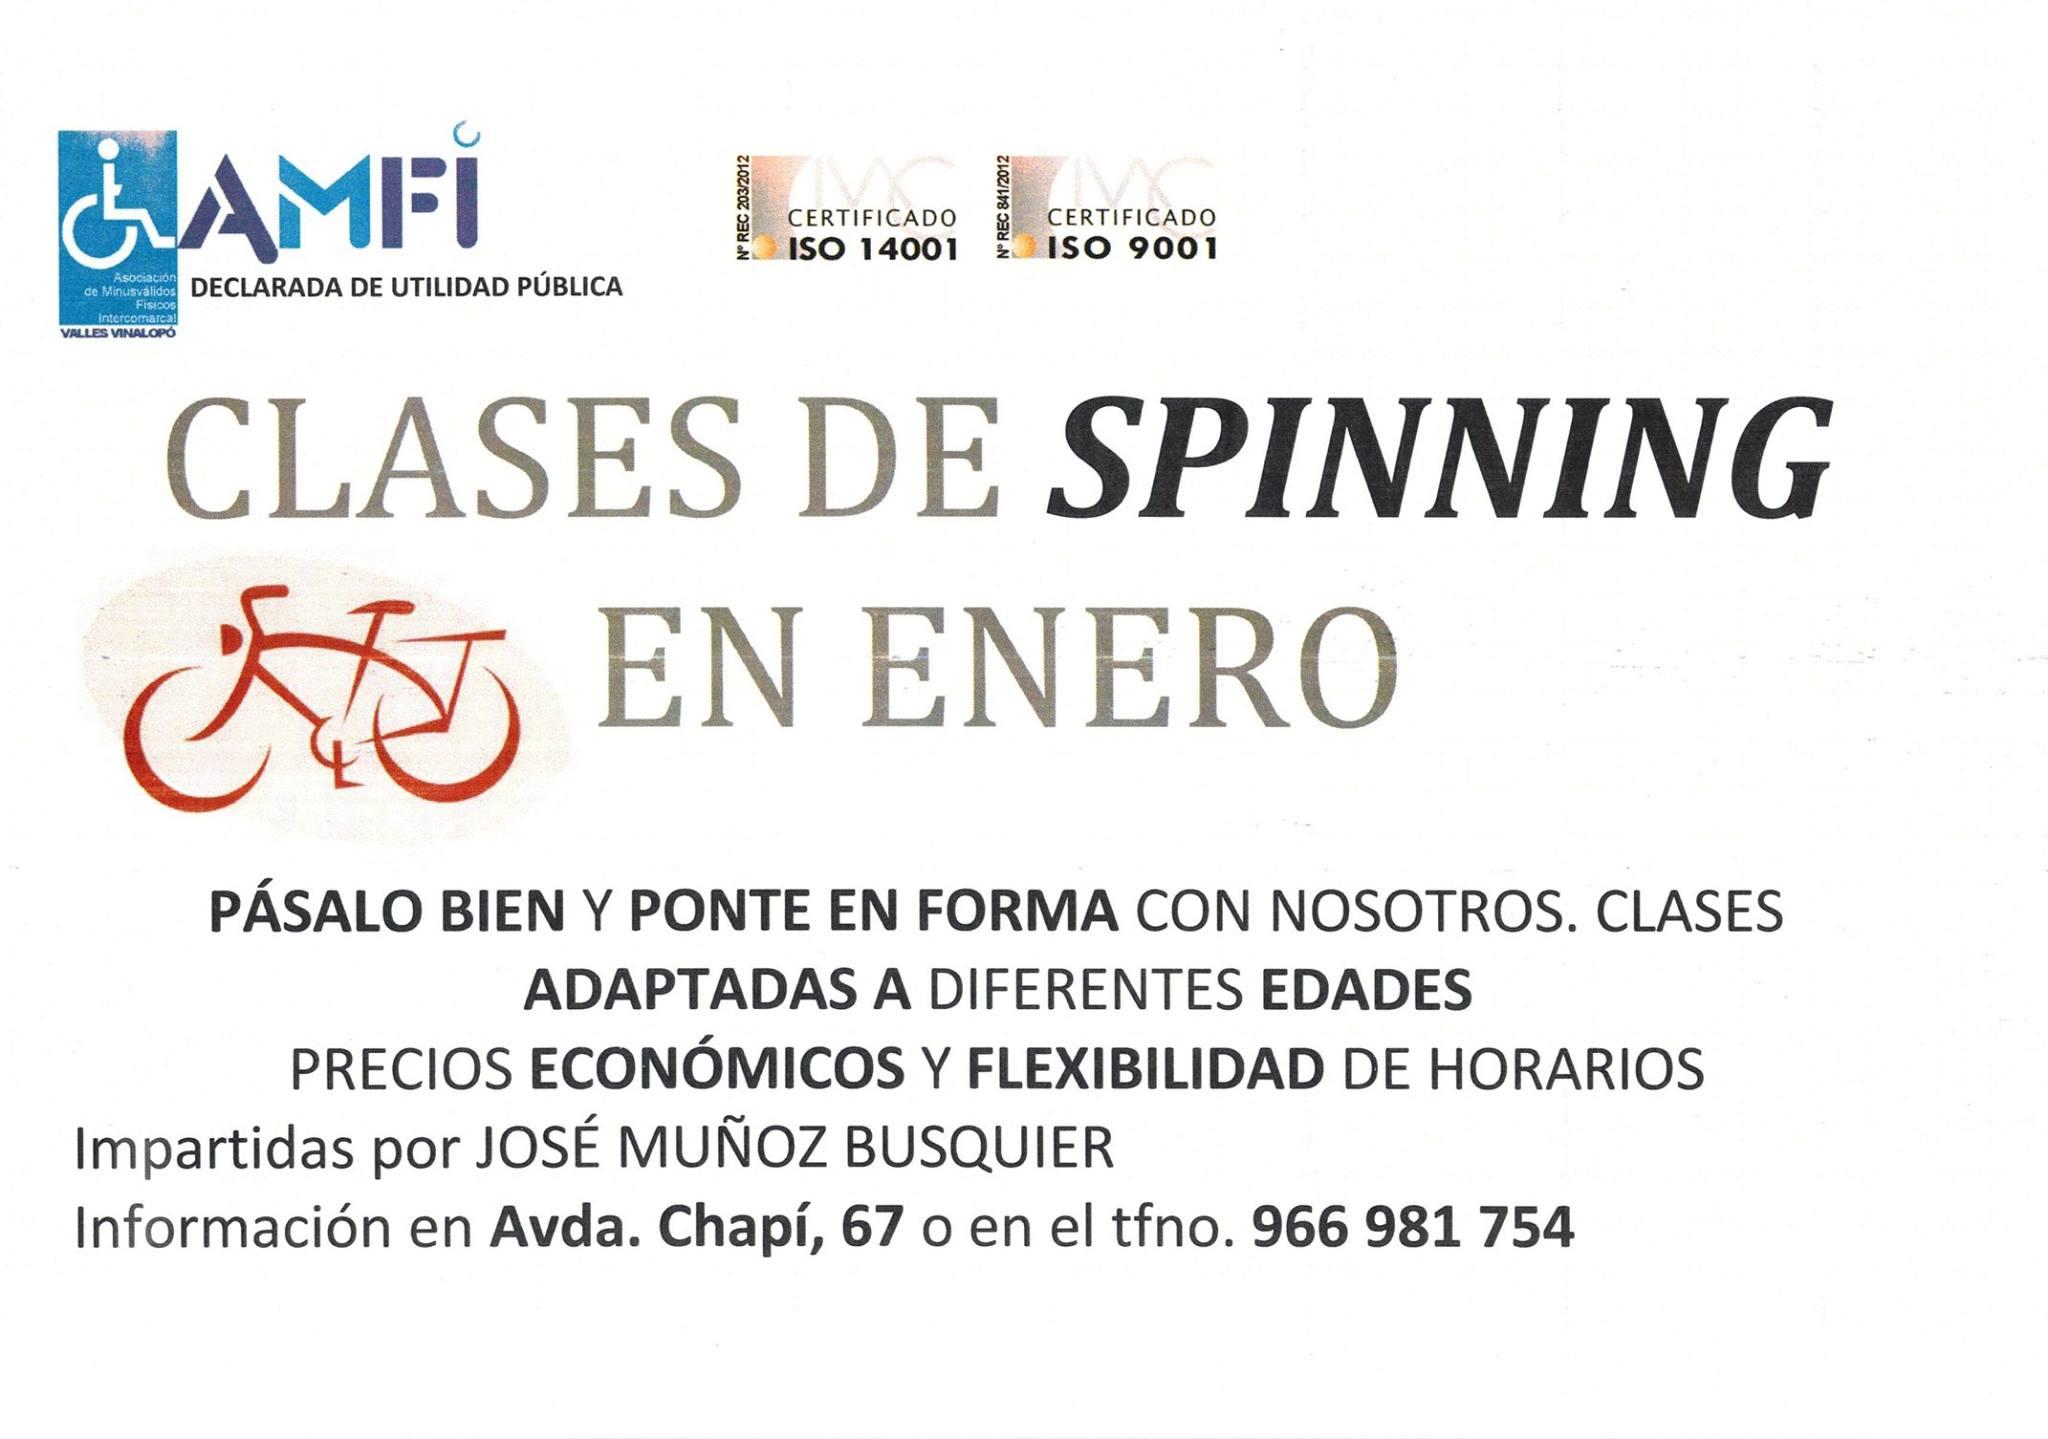 Amfi clases de spinning en enero for Clases de spinning